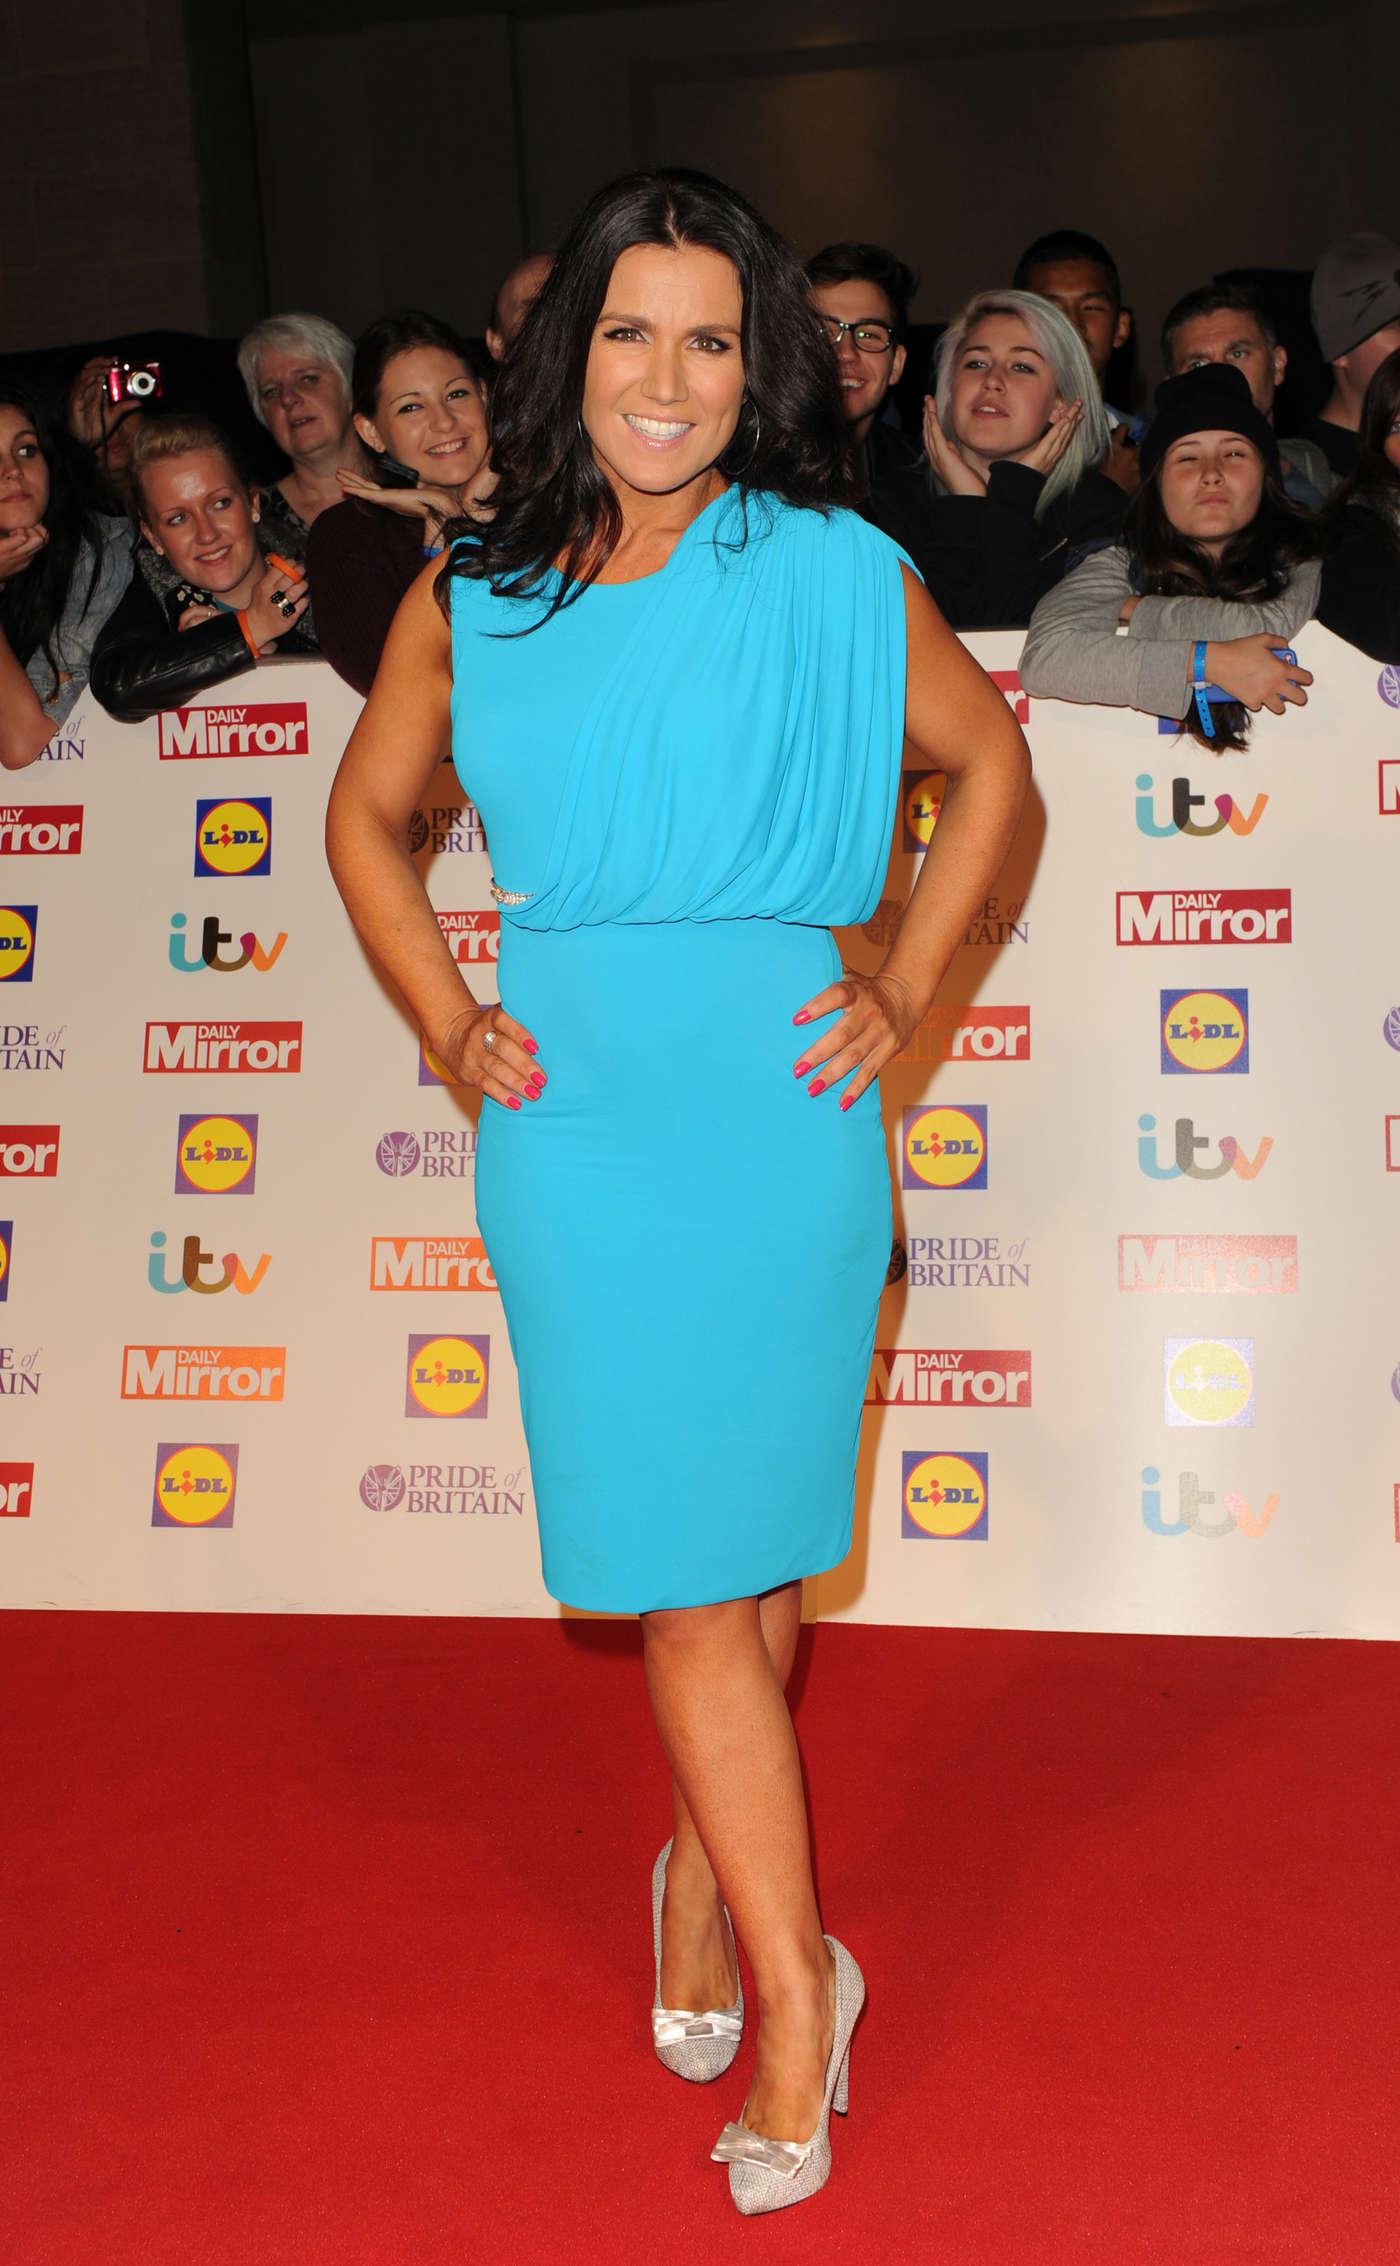 Susanna Reid at Pride of Britain Awards in London